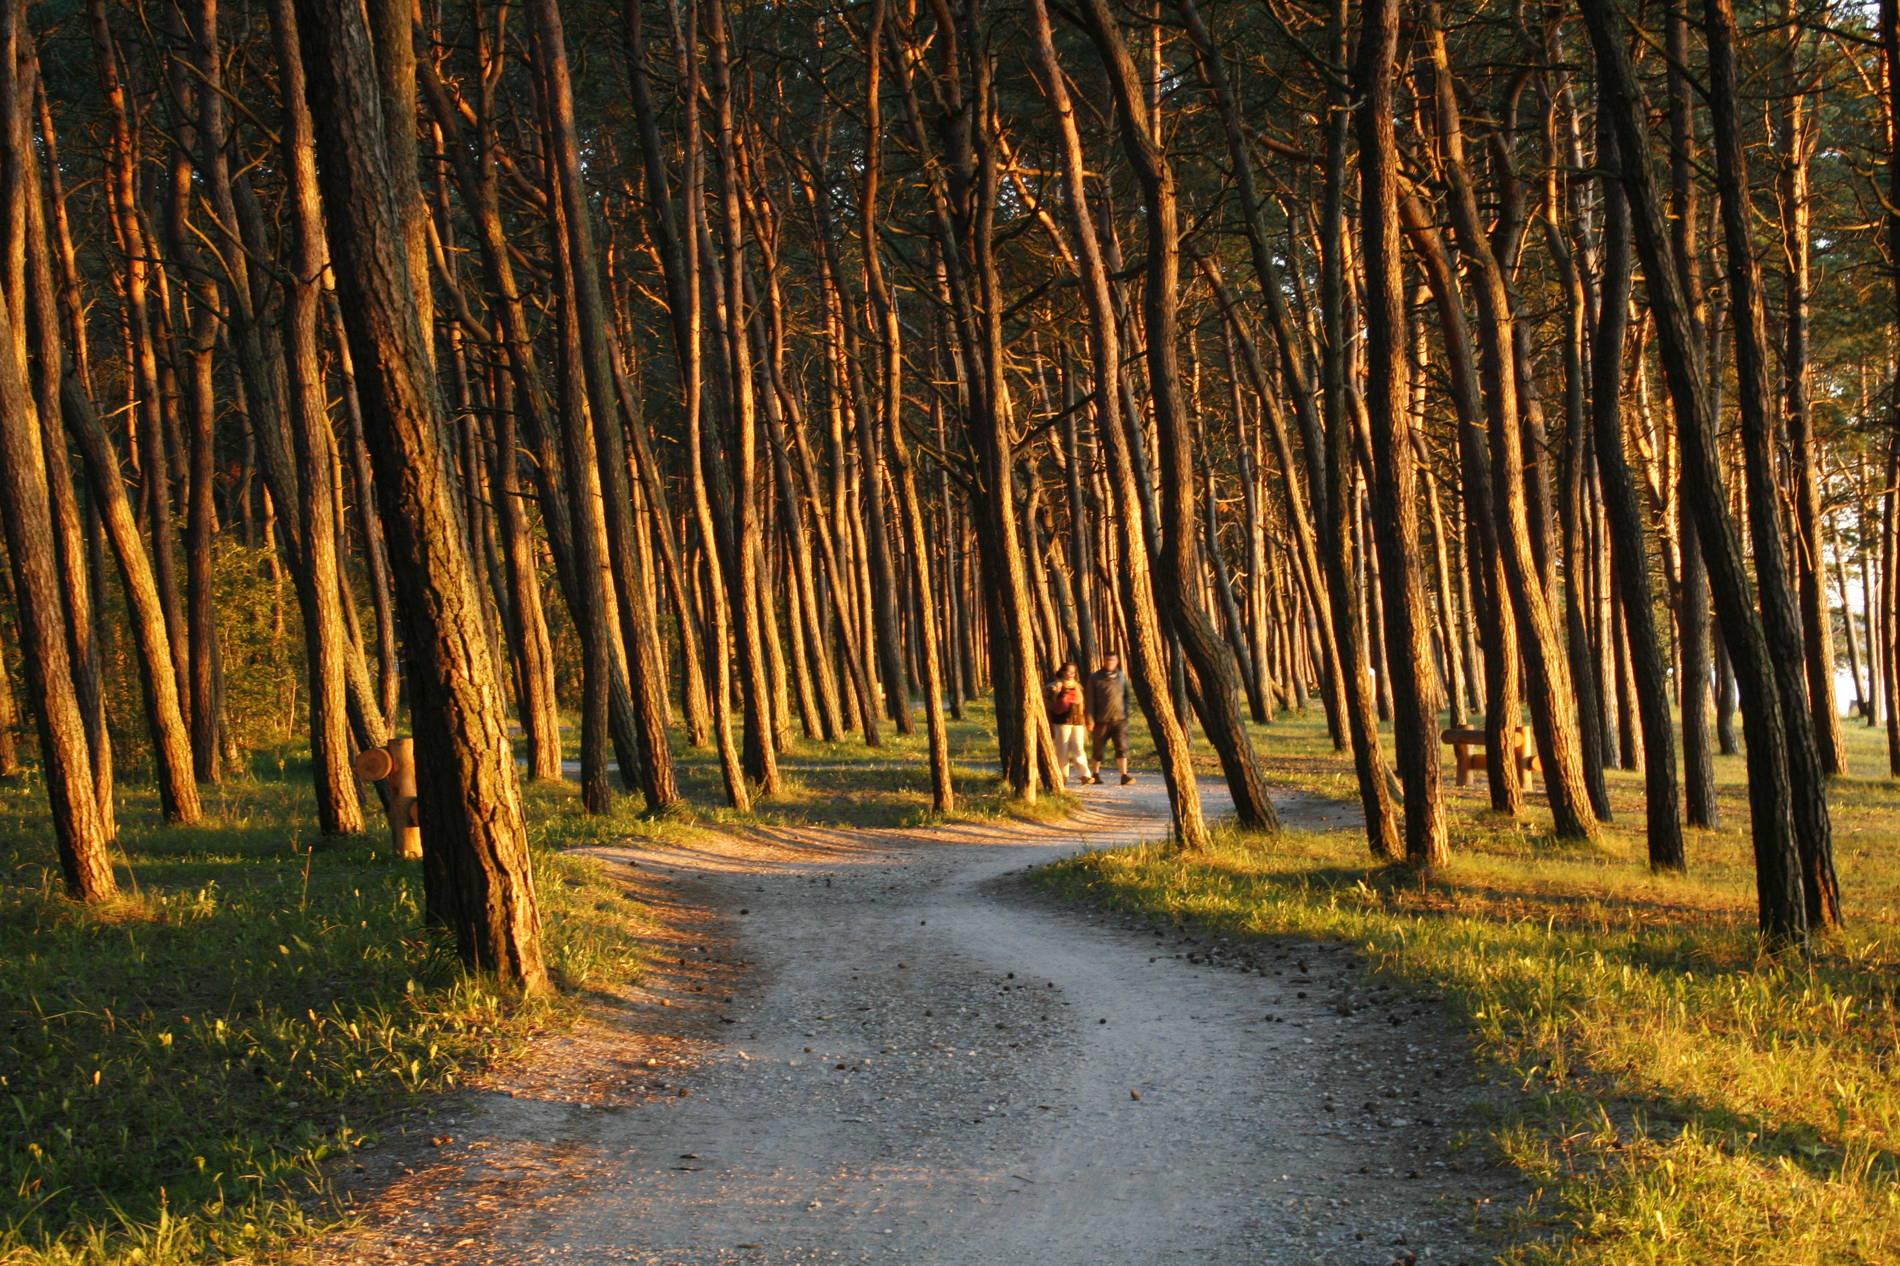 Pirita forest in Tallinn, Estonia